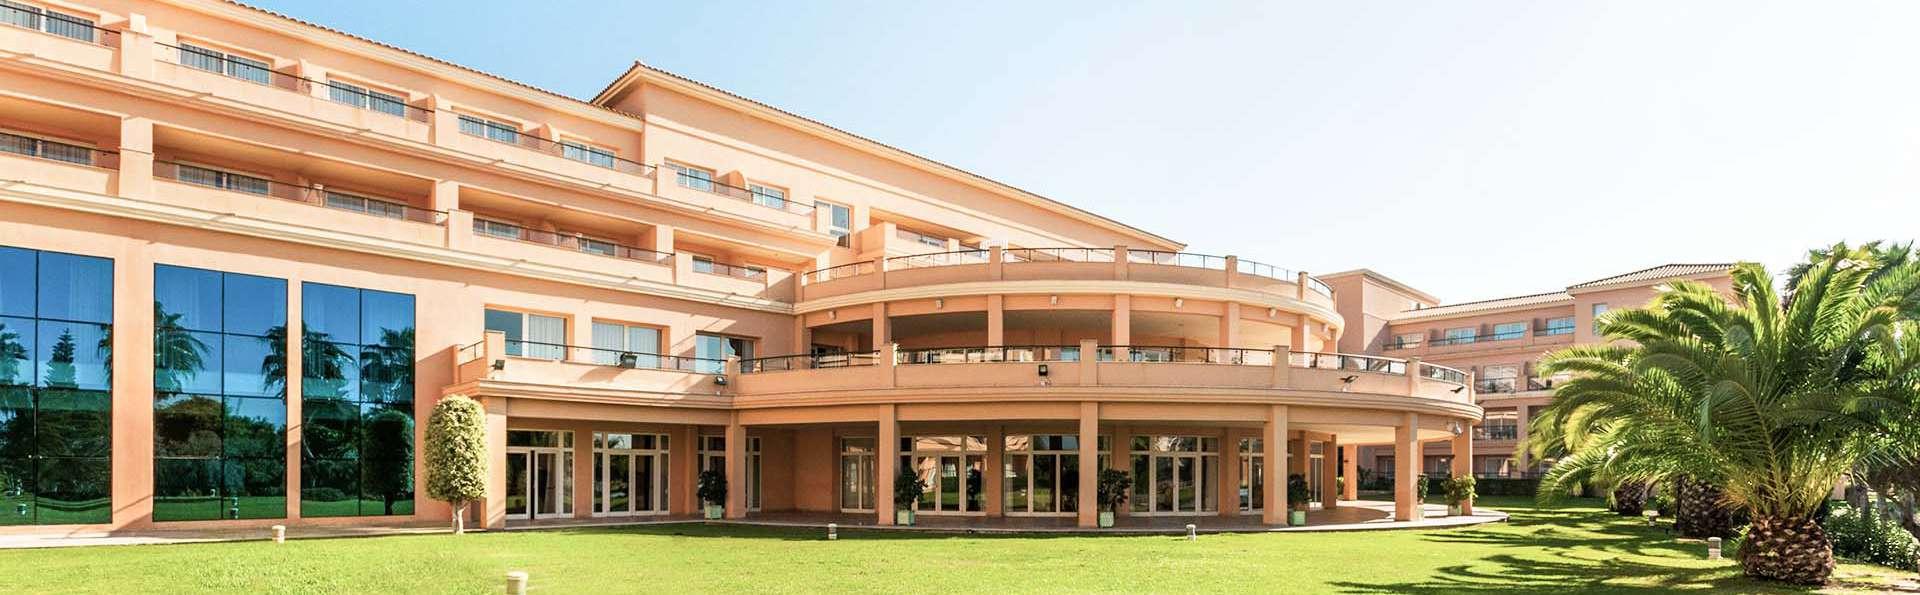 Hotel Alicante Golf & Spa - EDIT_EXTERIOR_03.jpg